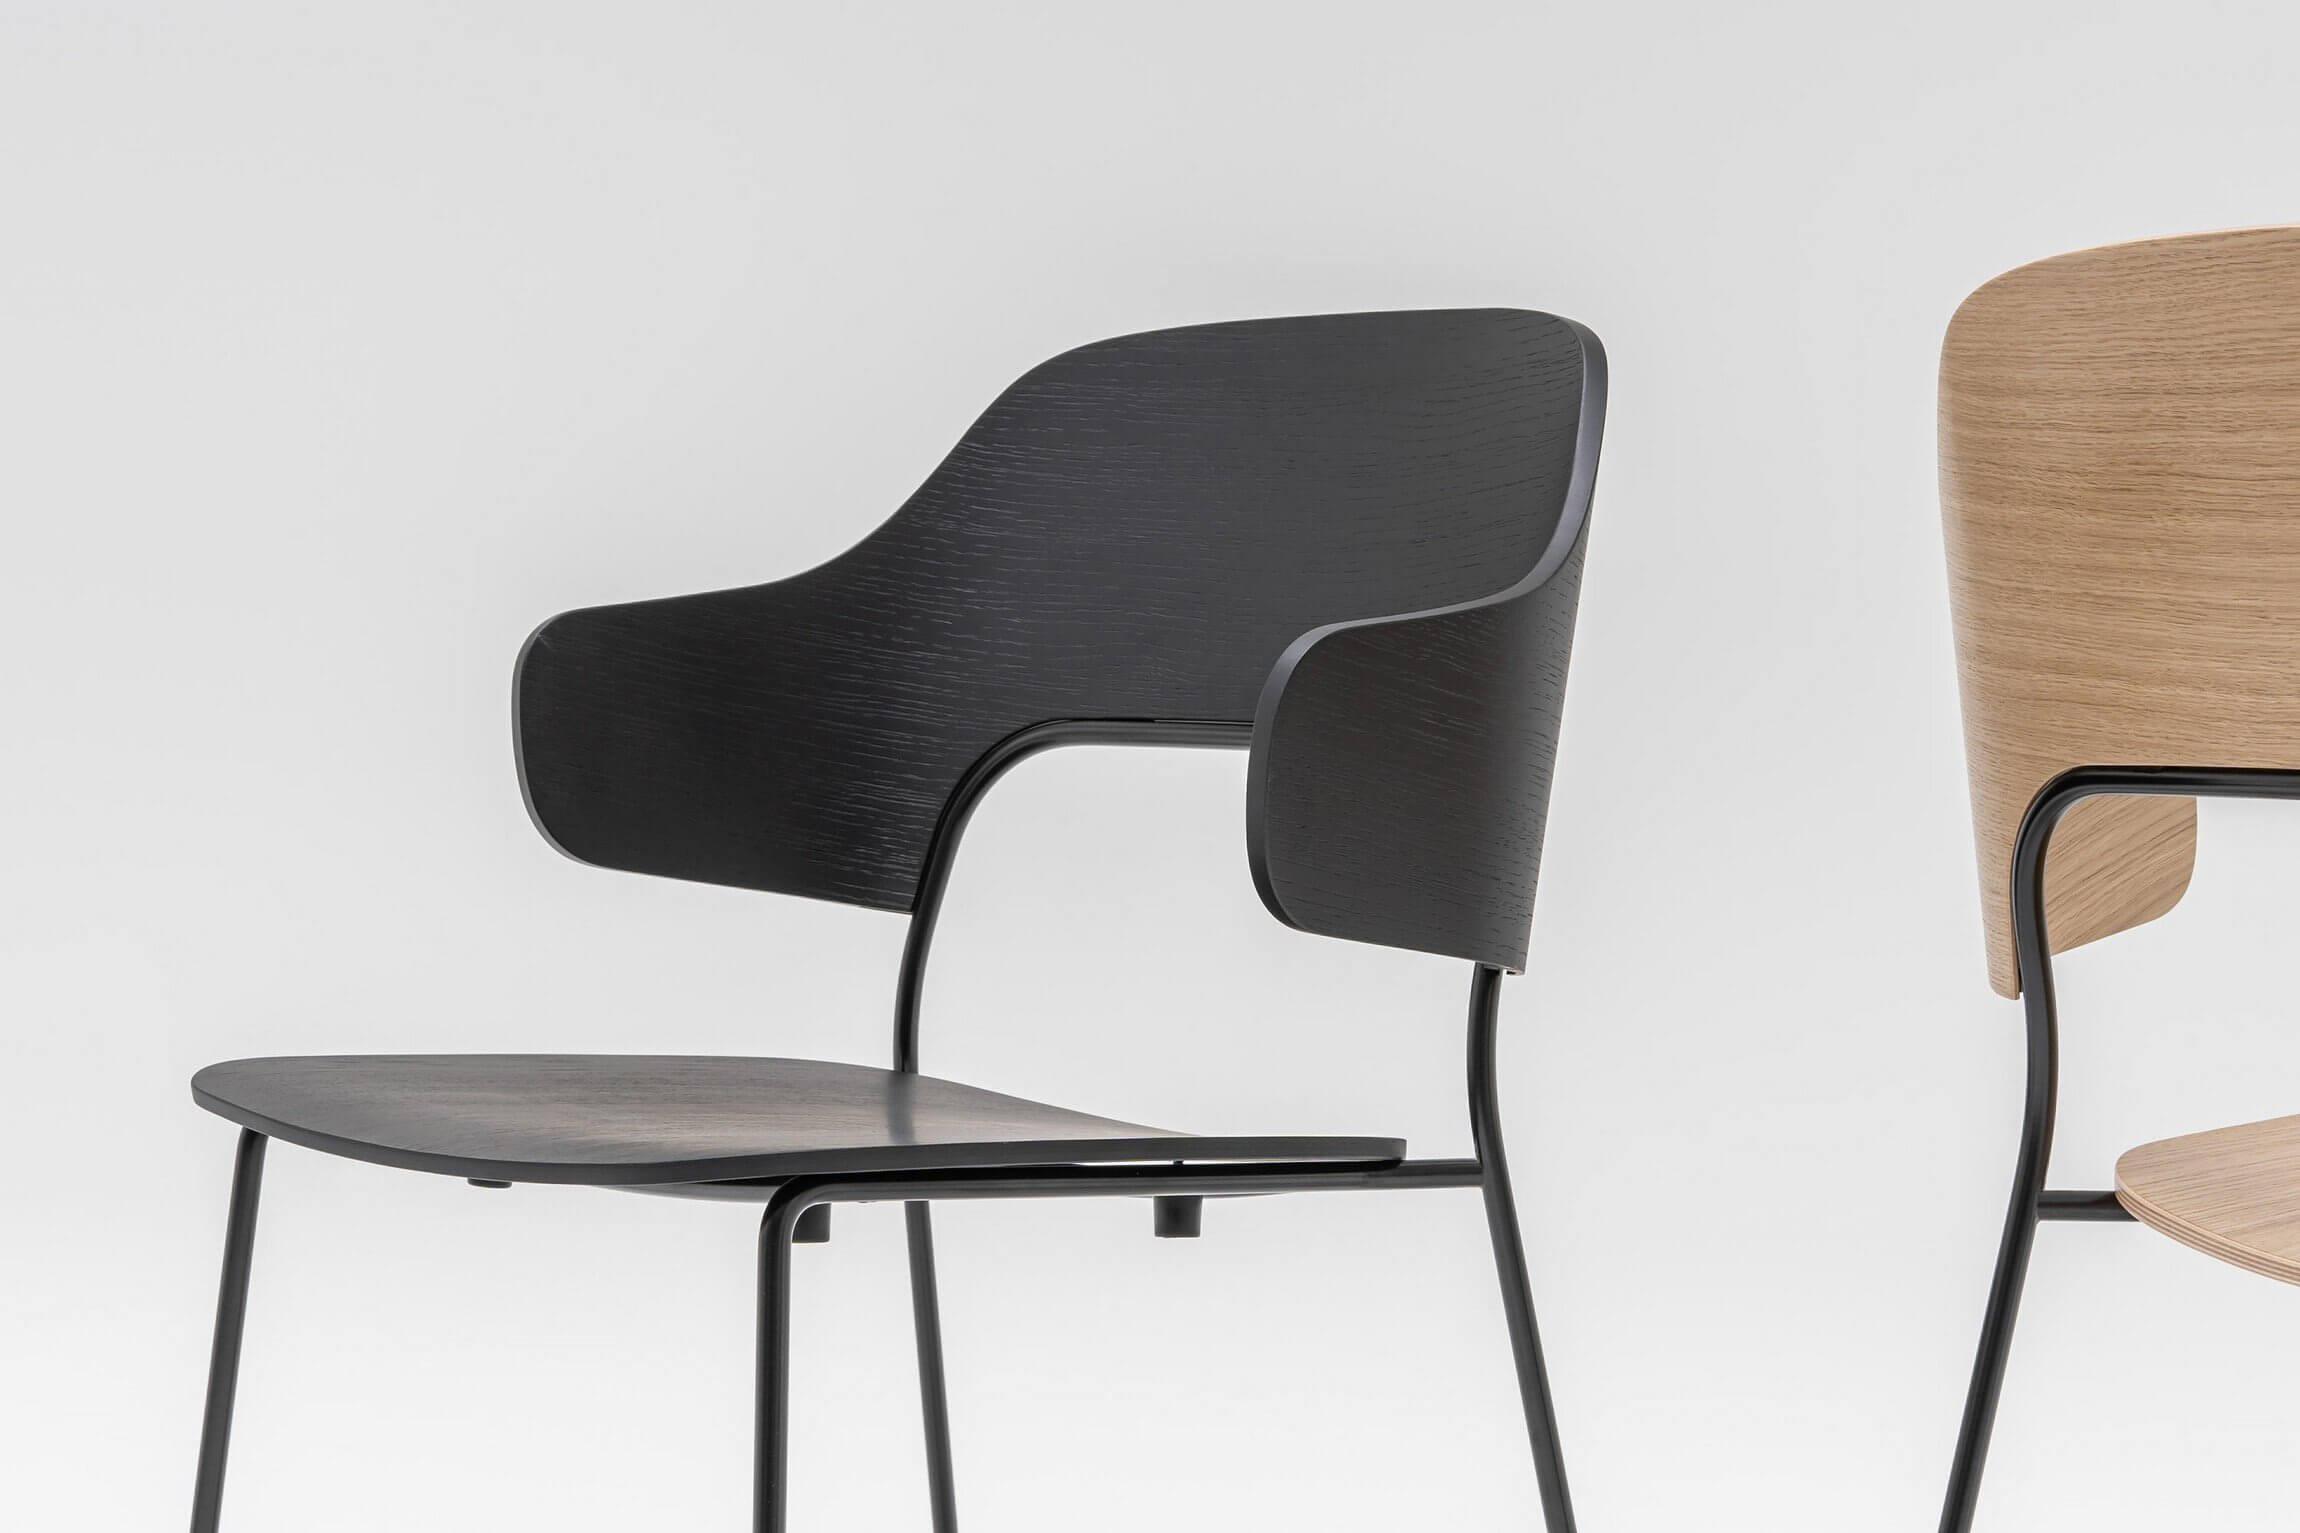 Chaise de restaurant moderne et confortable FEEL.